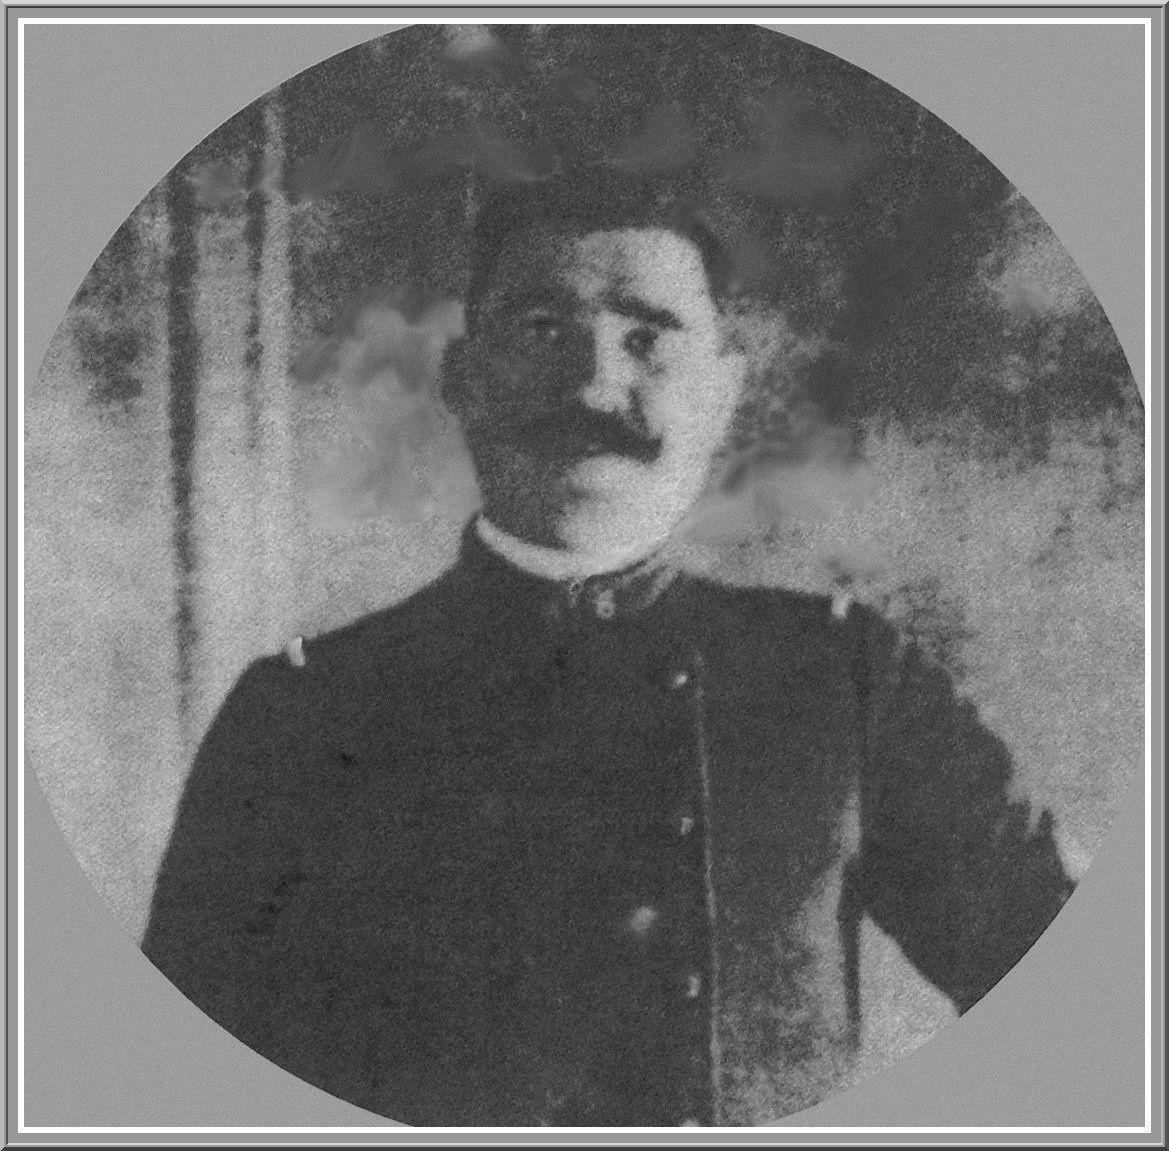 Jacques Marchalot